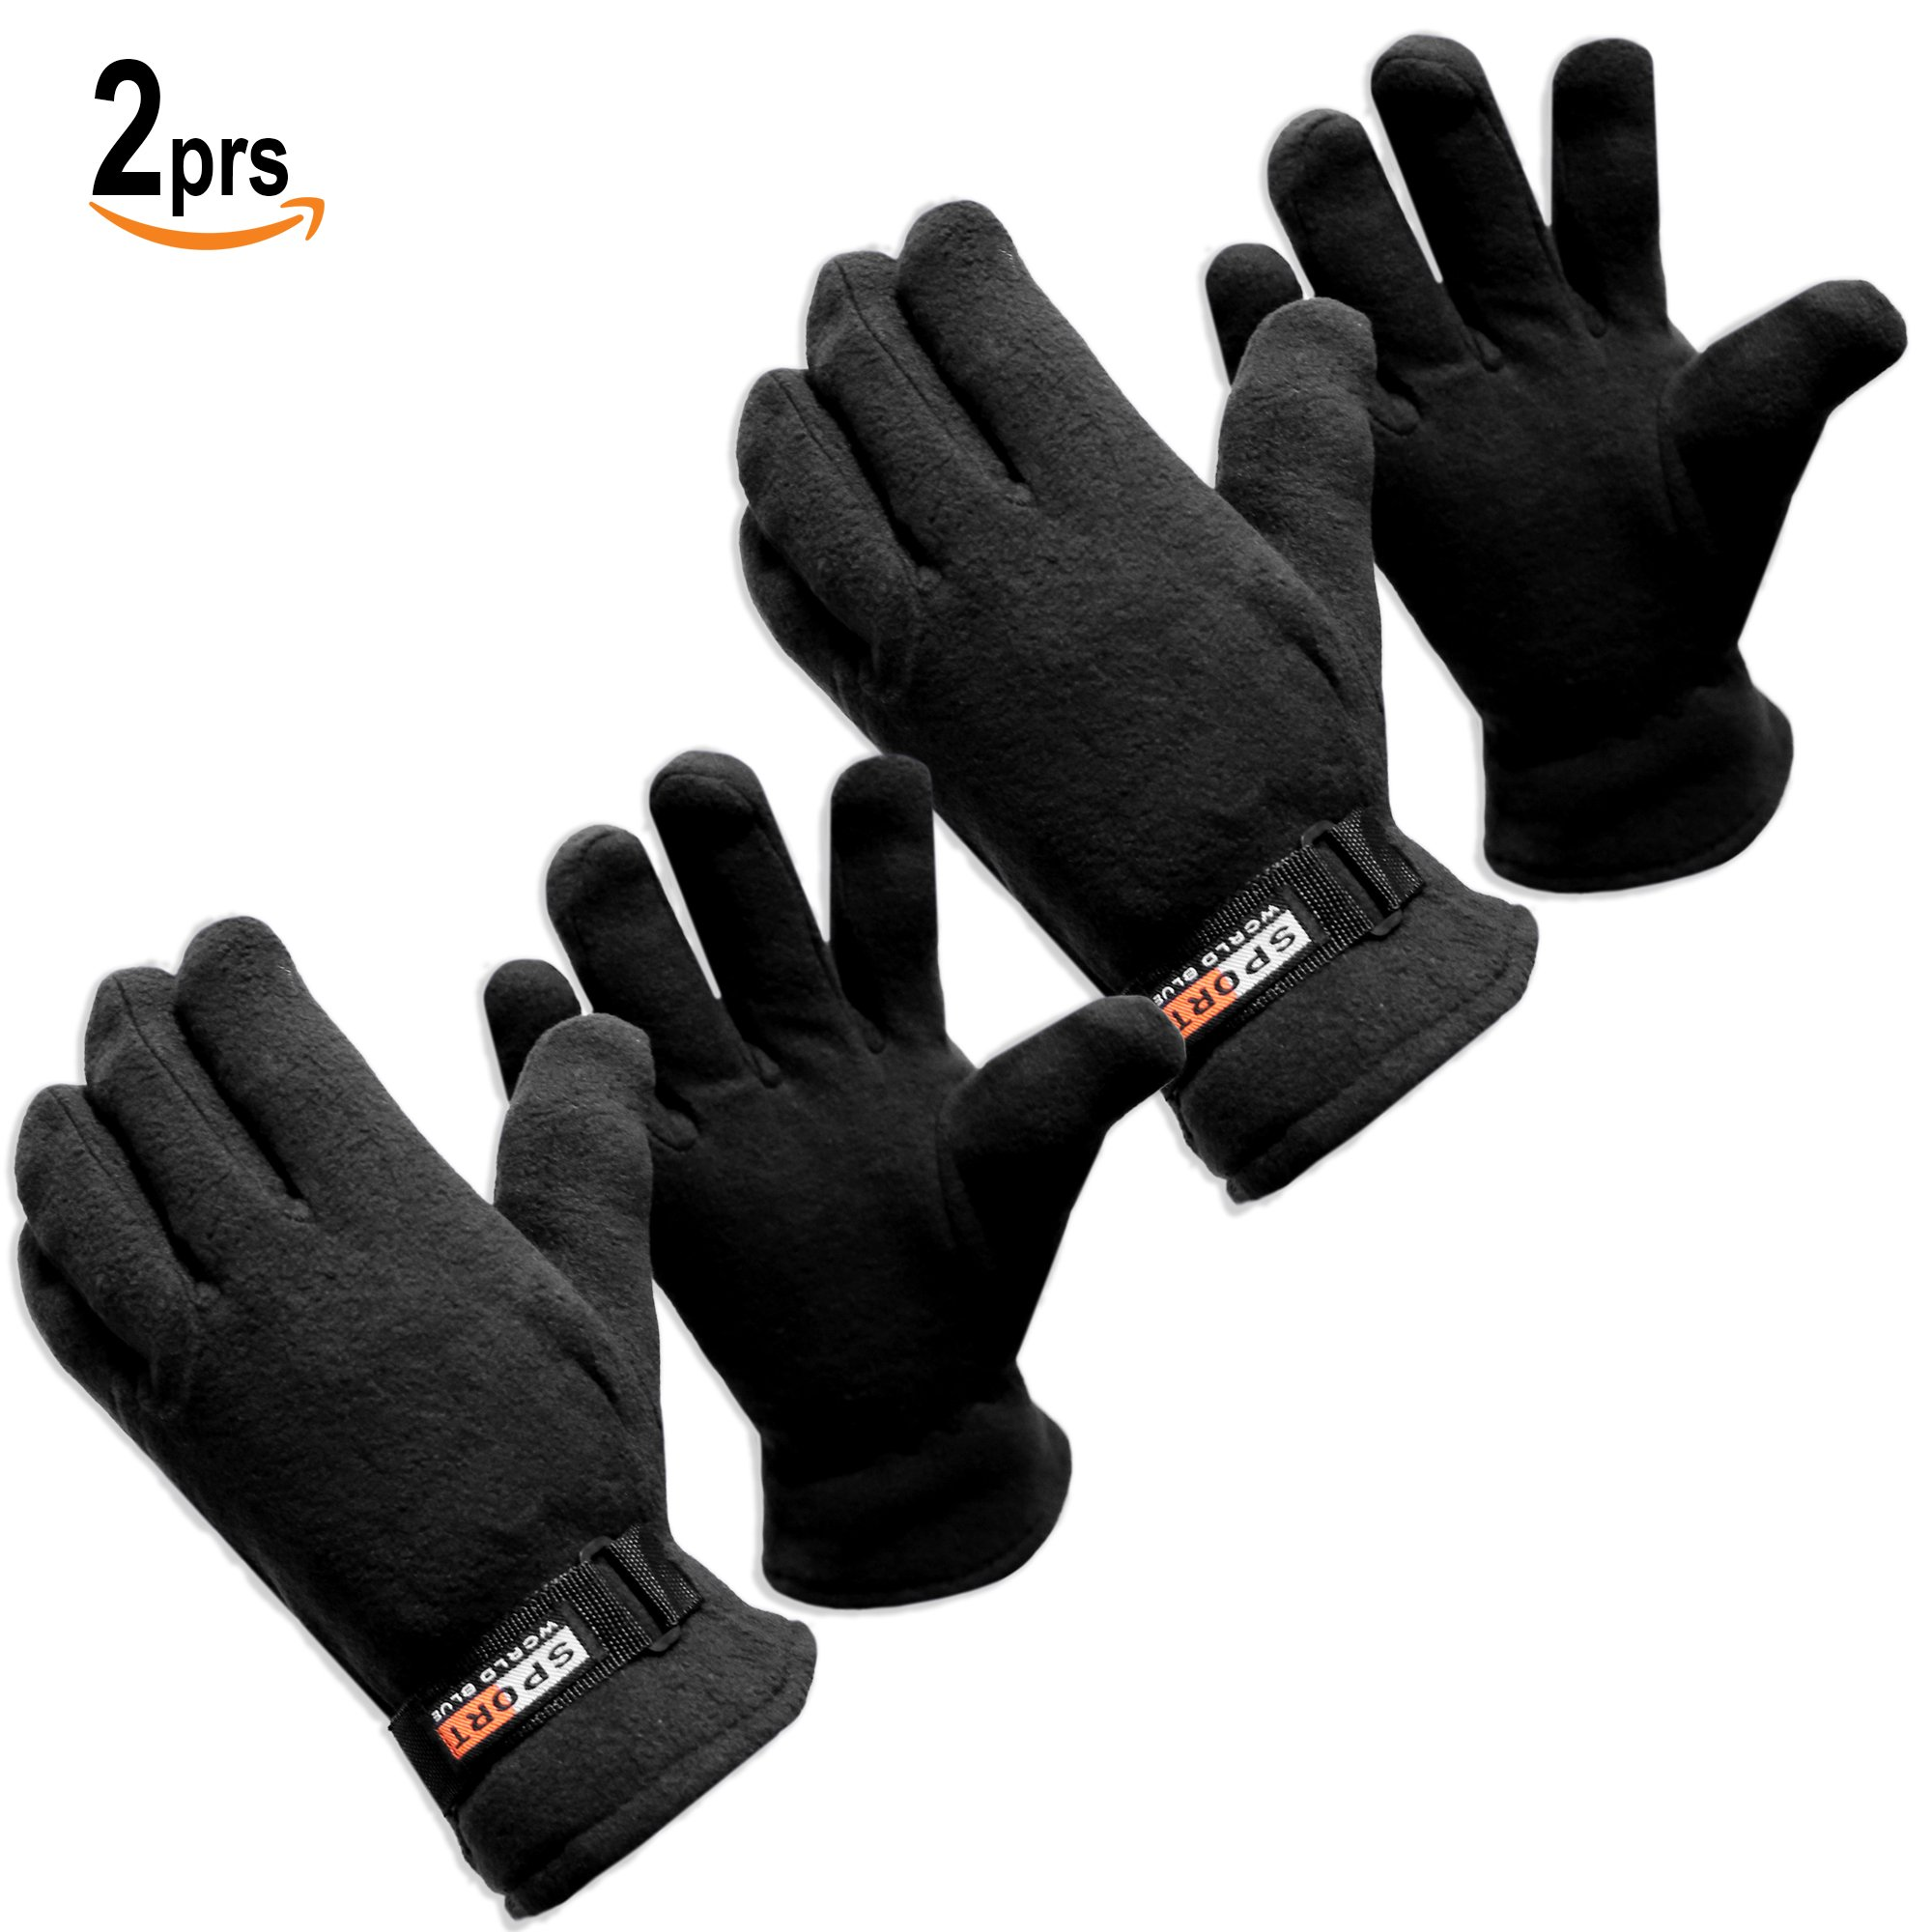 Basico Men Women Winter Fleece Gloves Light weight Various Colors Sizes (Large, 2prs Black)